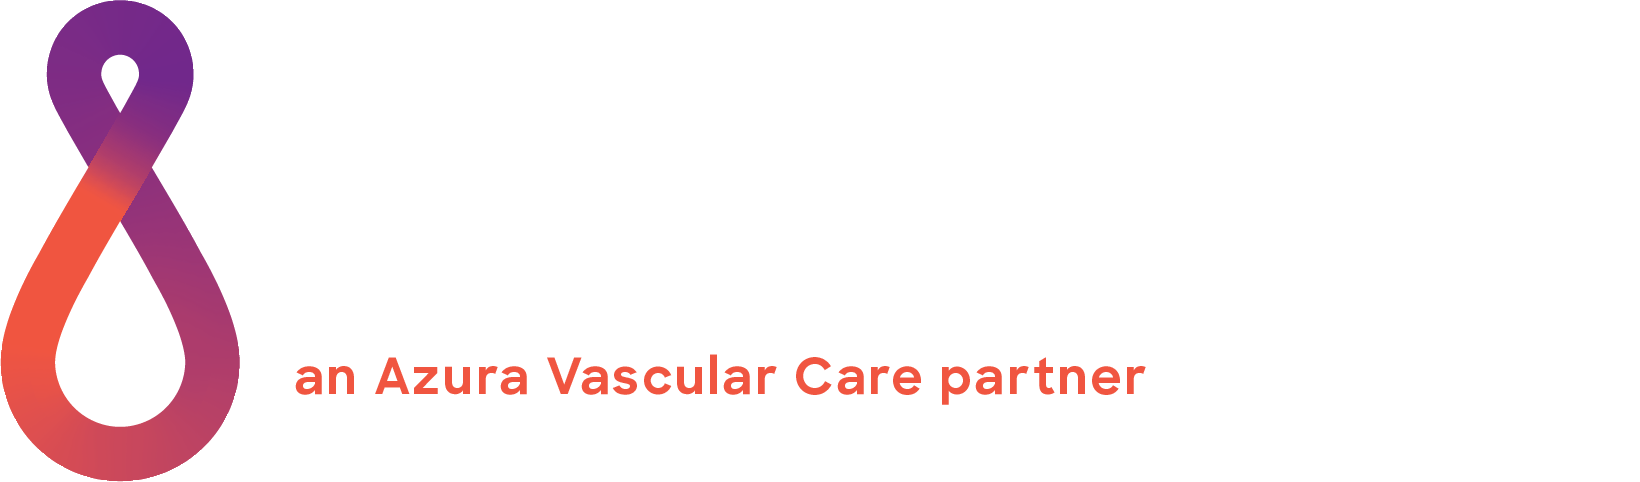 Verrazano Vascular Associates at AACP_Cobrand OBS Logo_Horizontal_4C KO.png